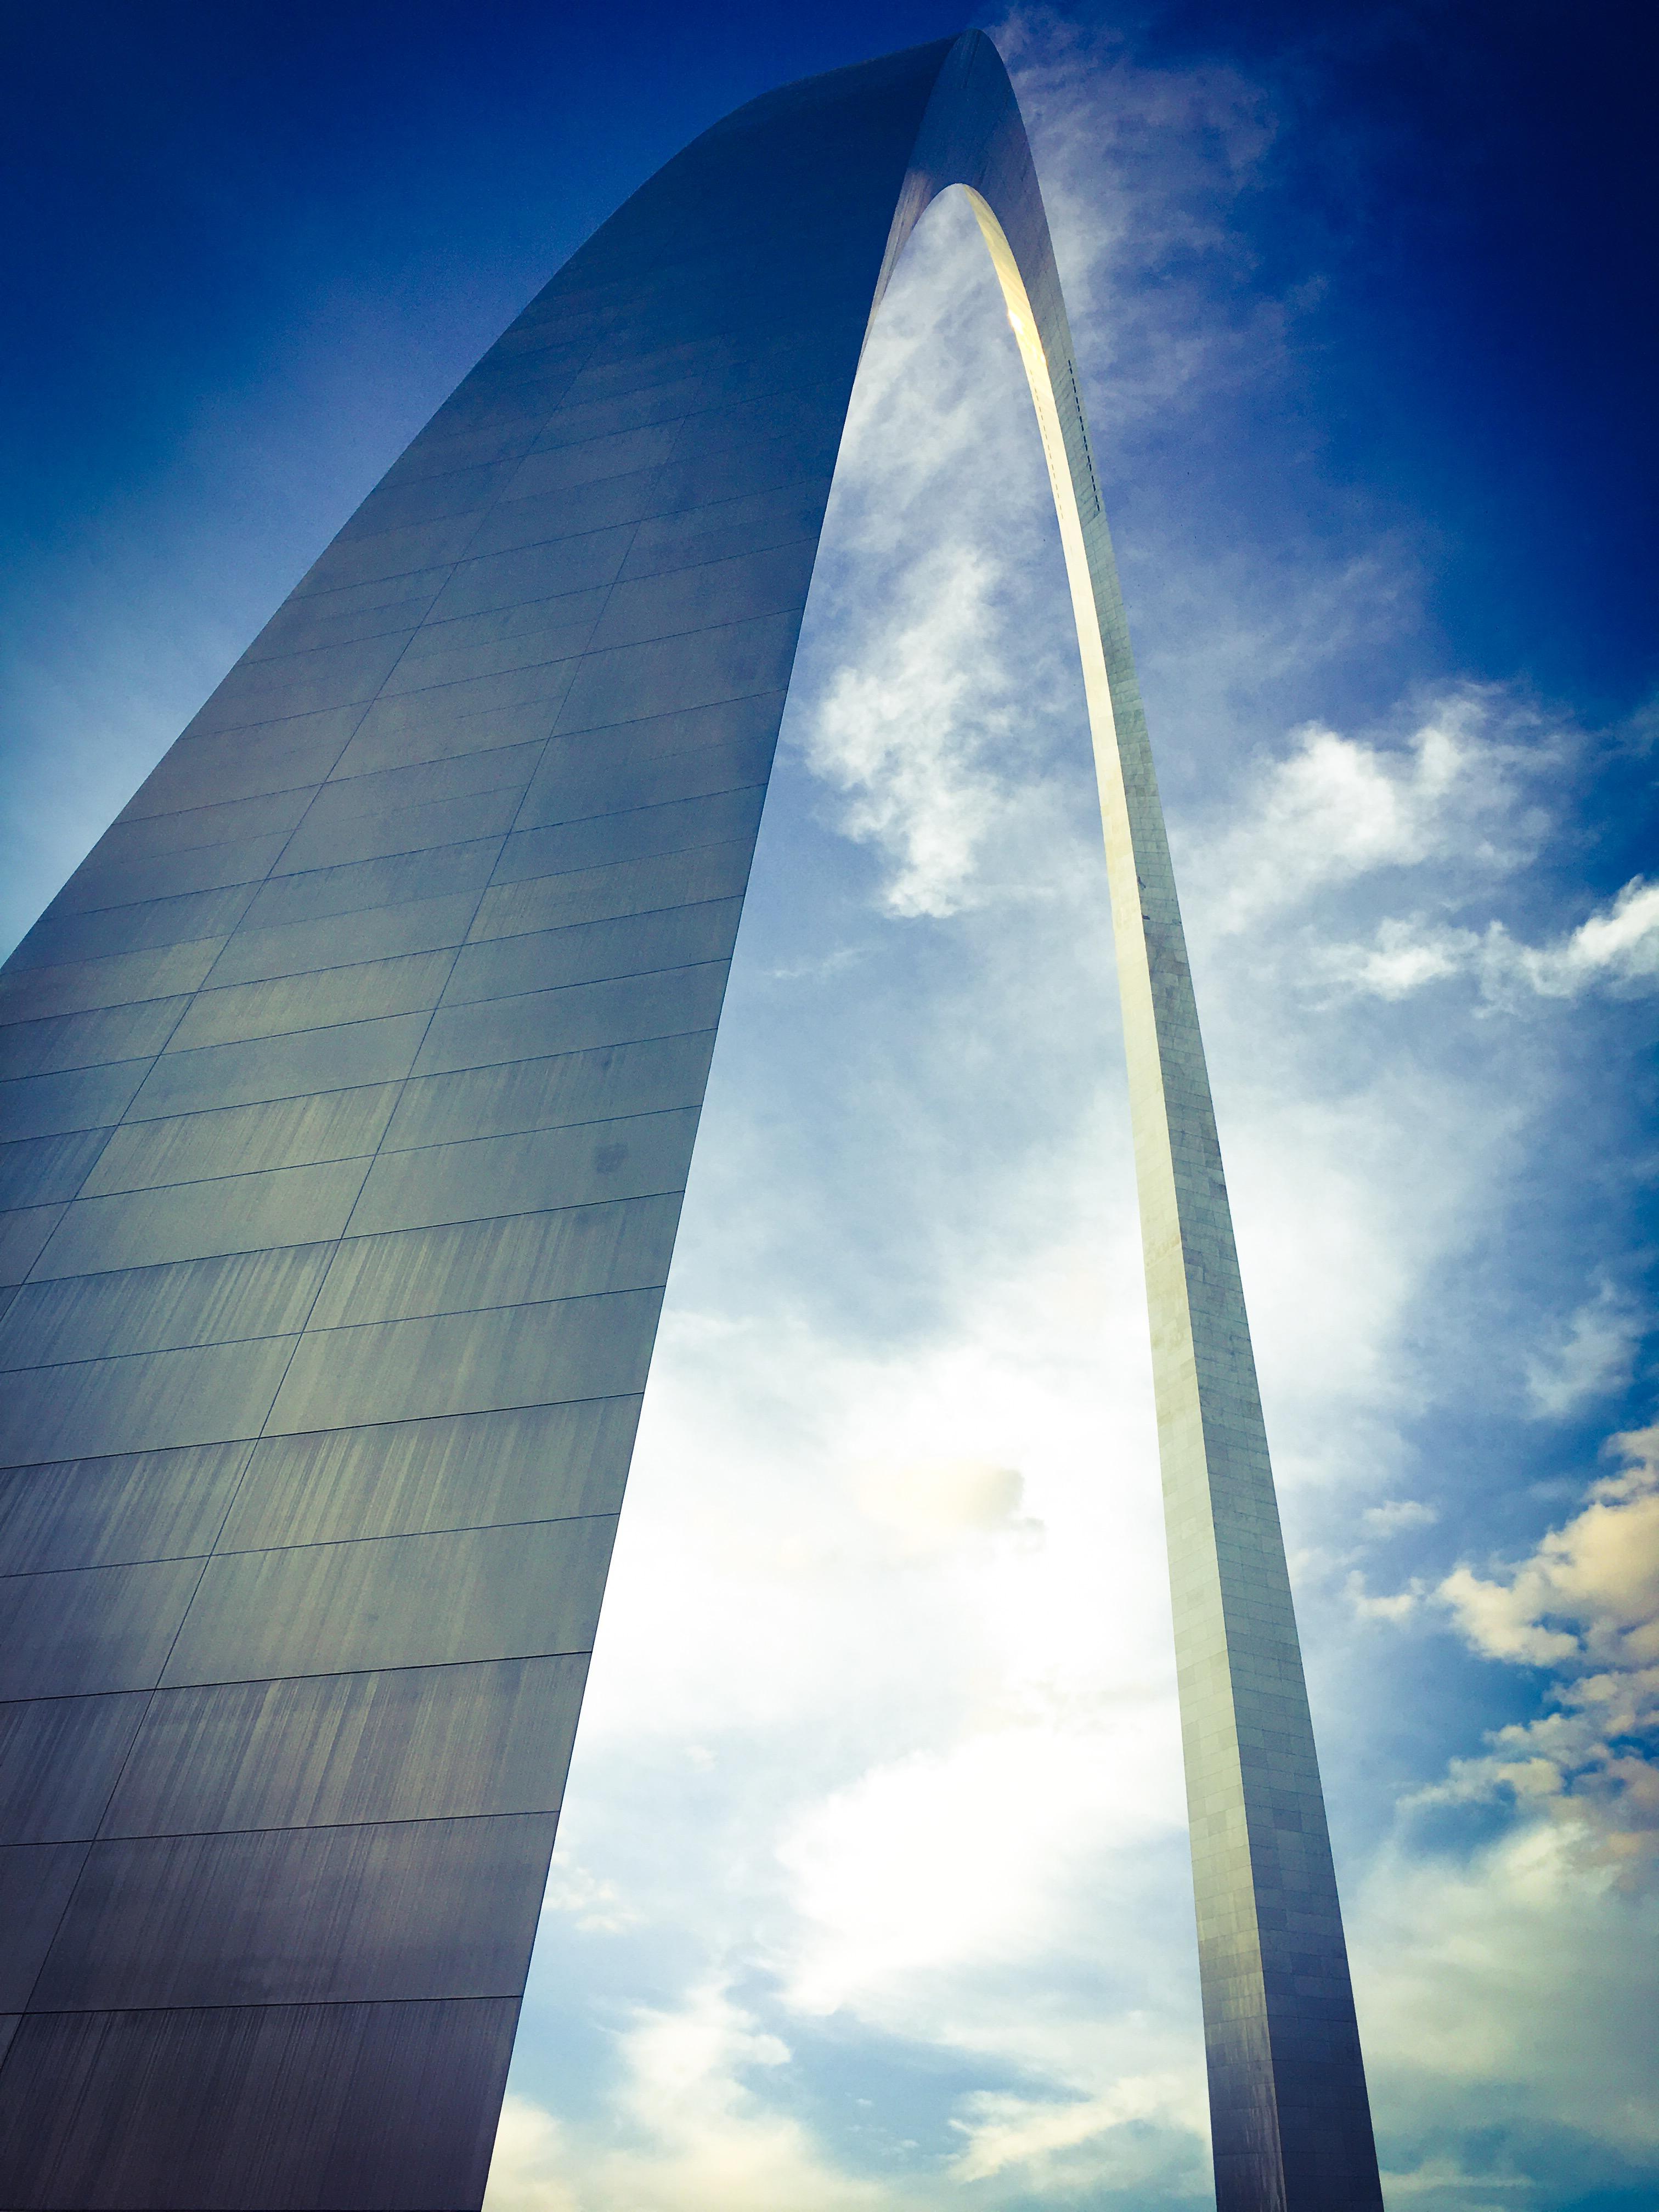 Gateway arch photo